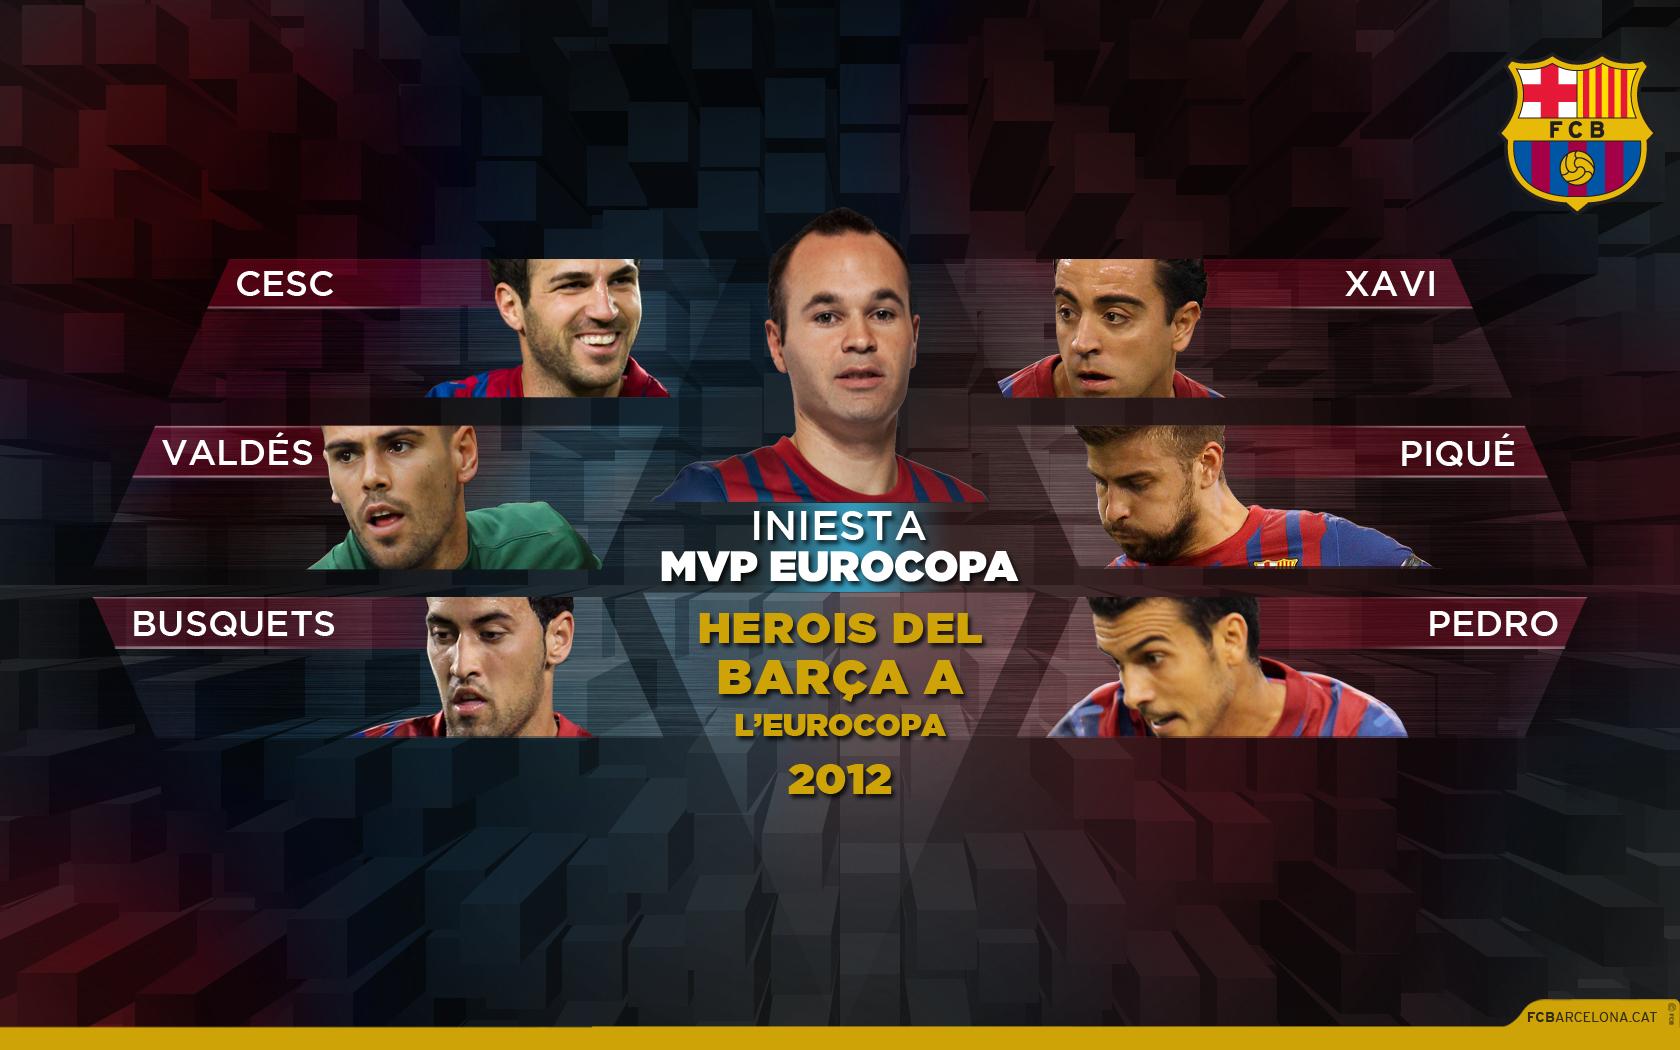 INIESTA MVP EUROCOPA 2012